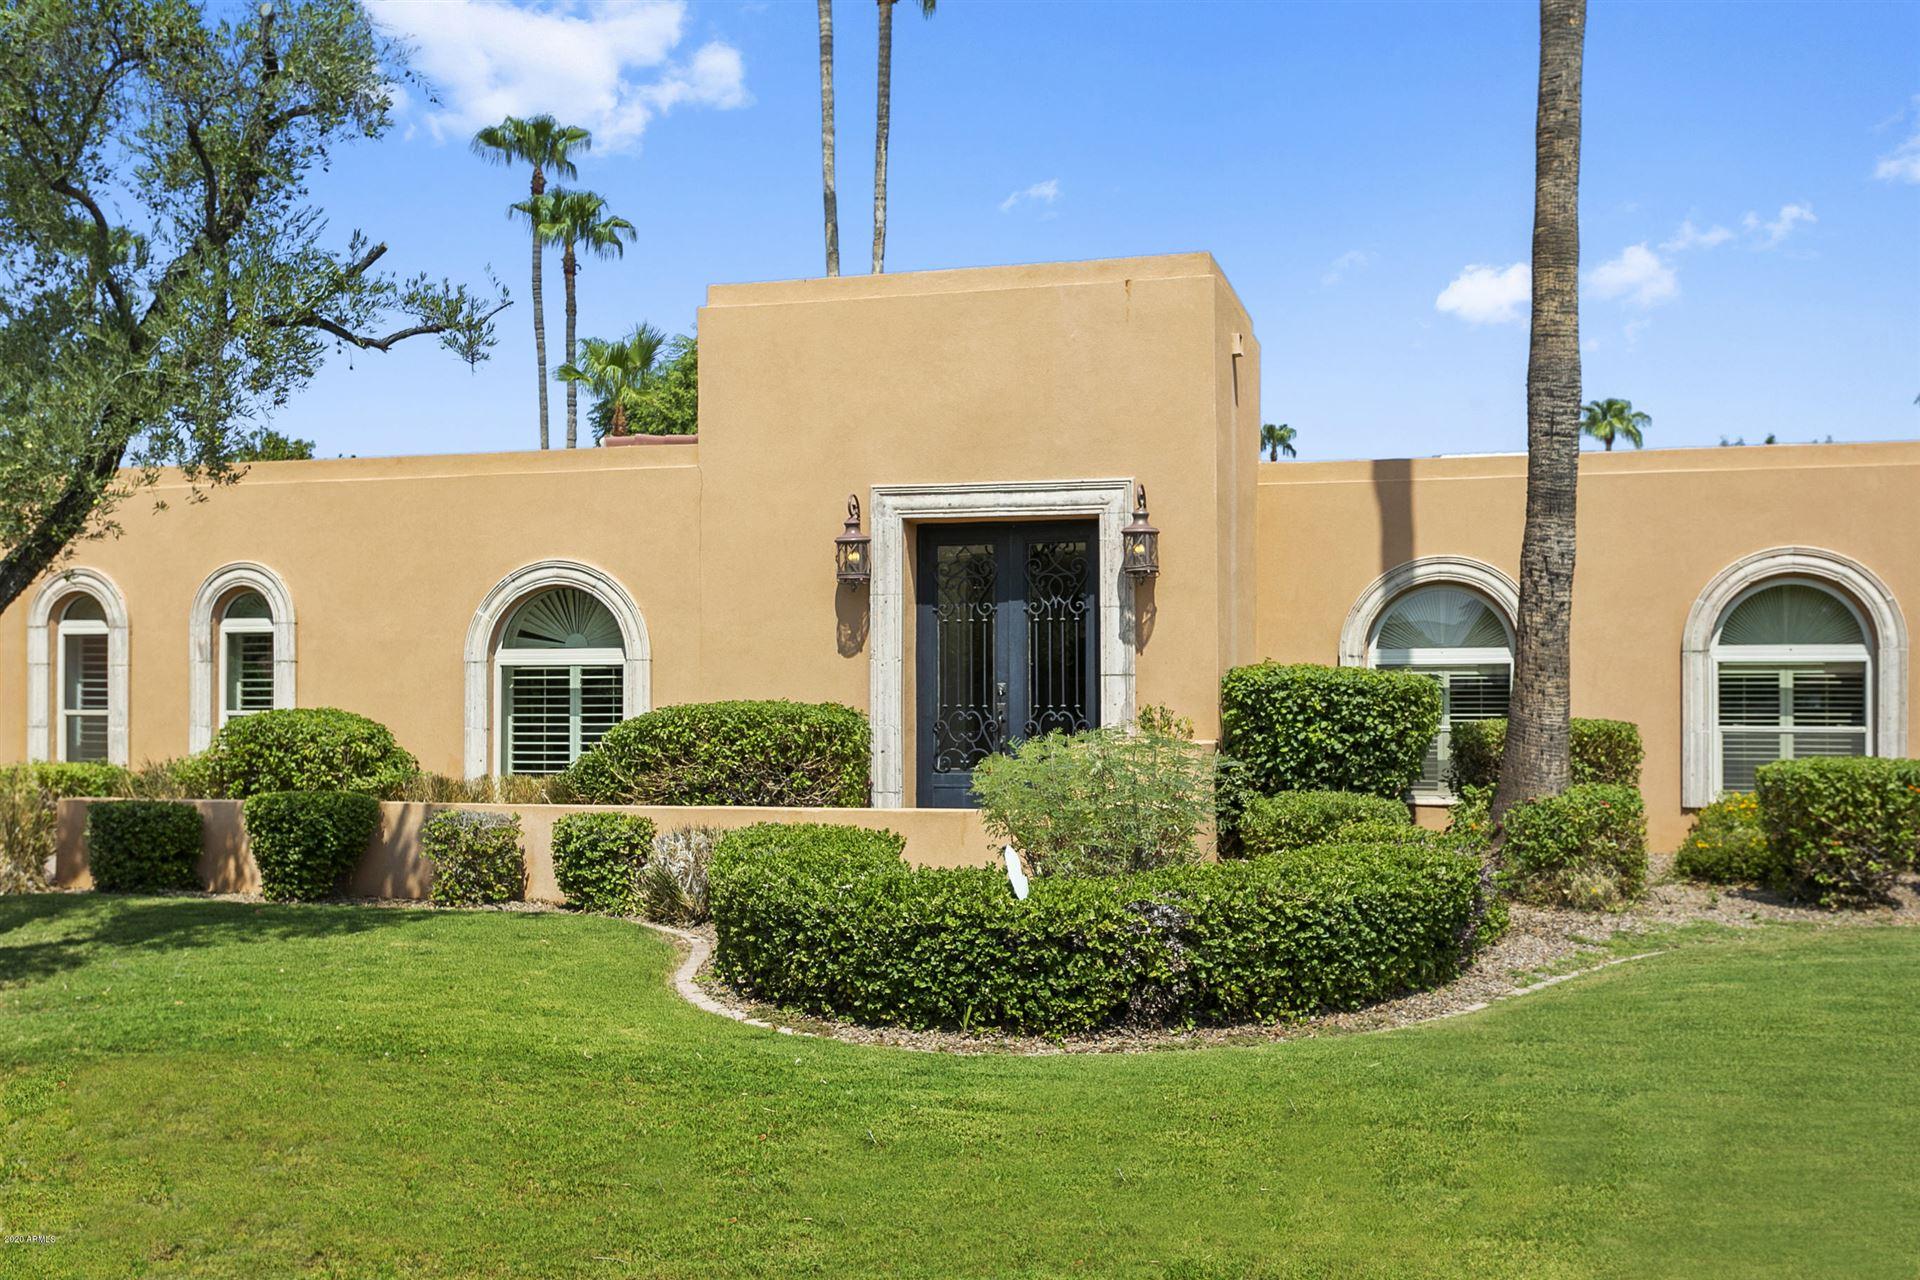 8108 E Del Acero Drive, Scottsdale, AZ 85258 - MLS#: 6116582